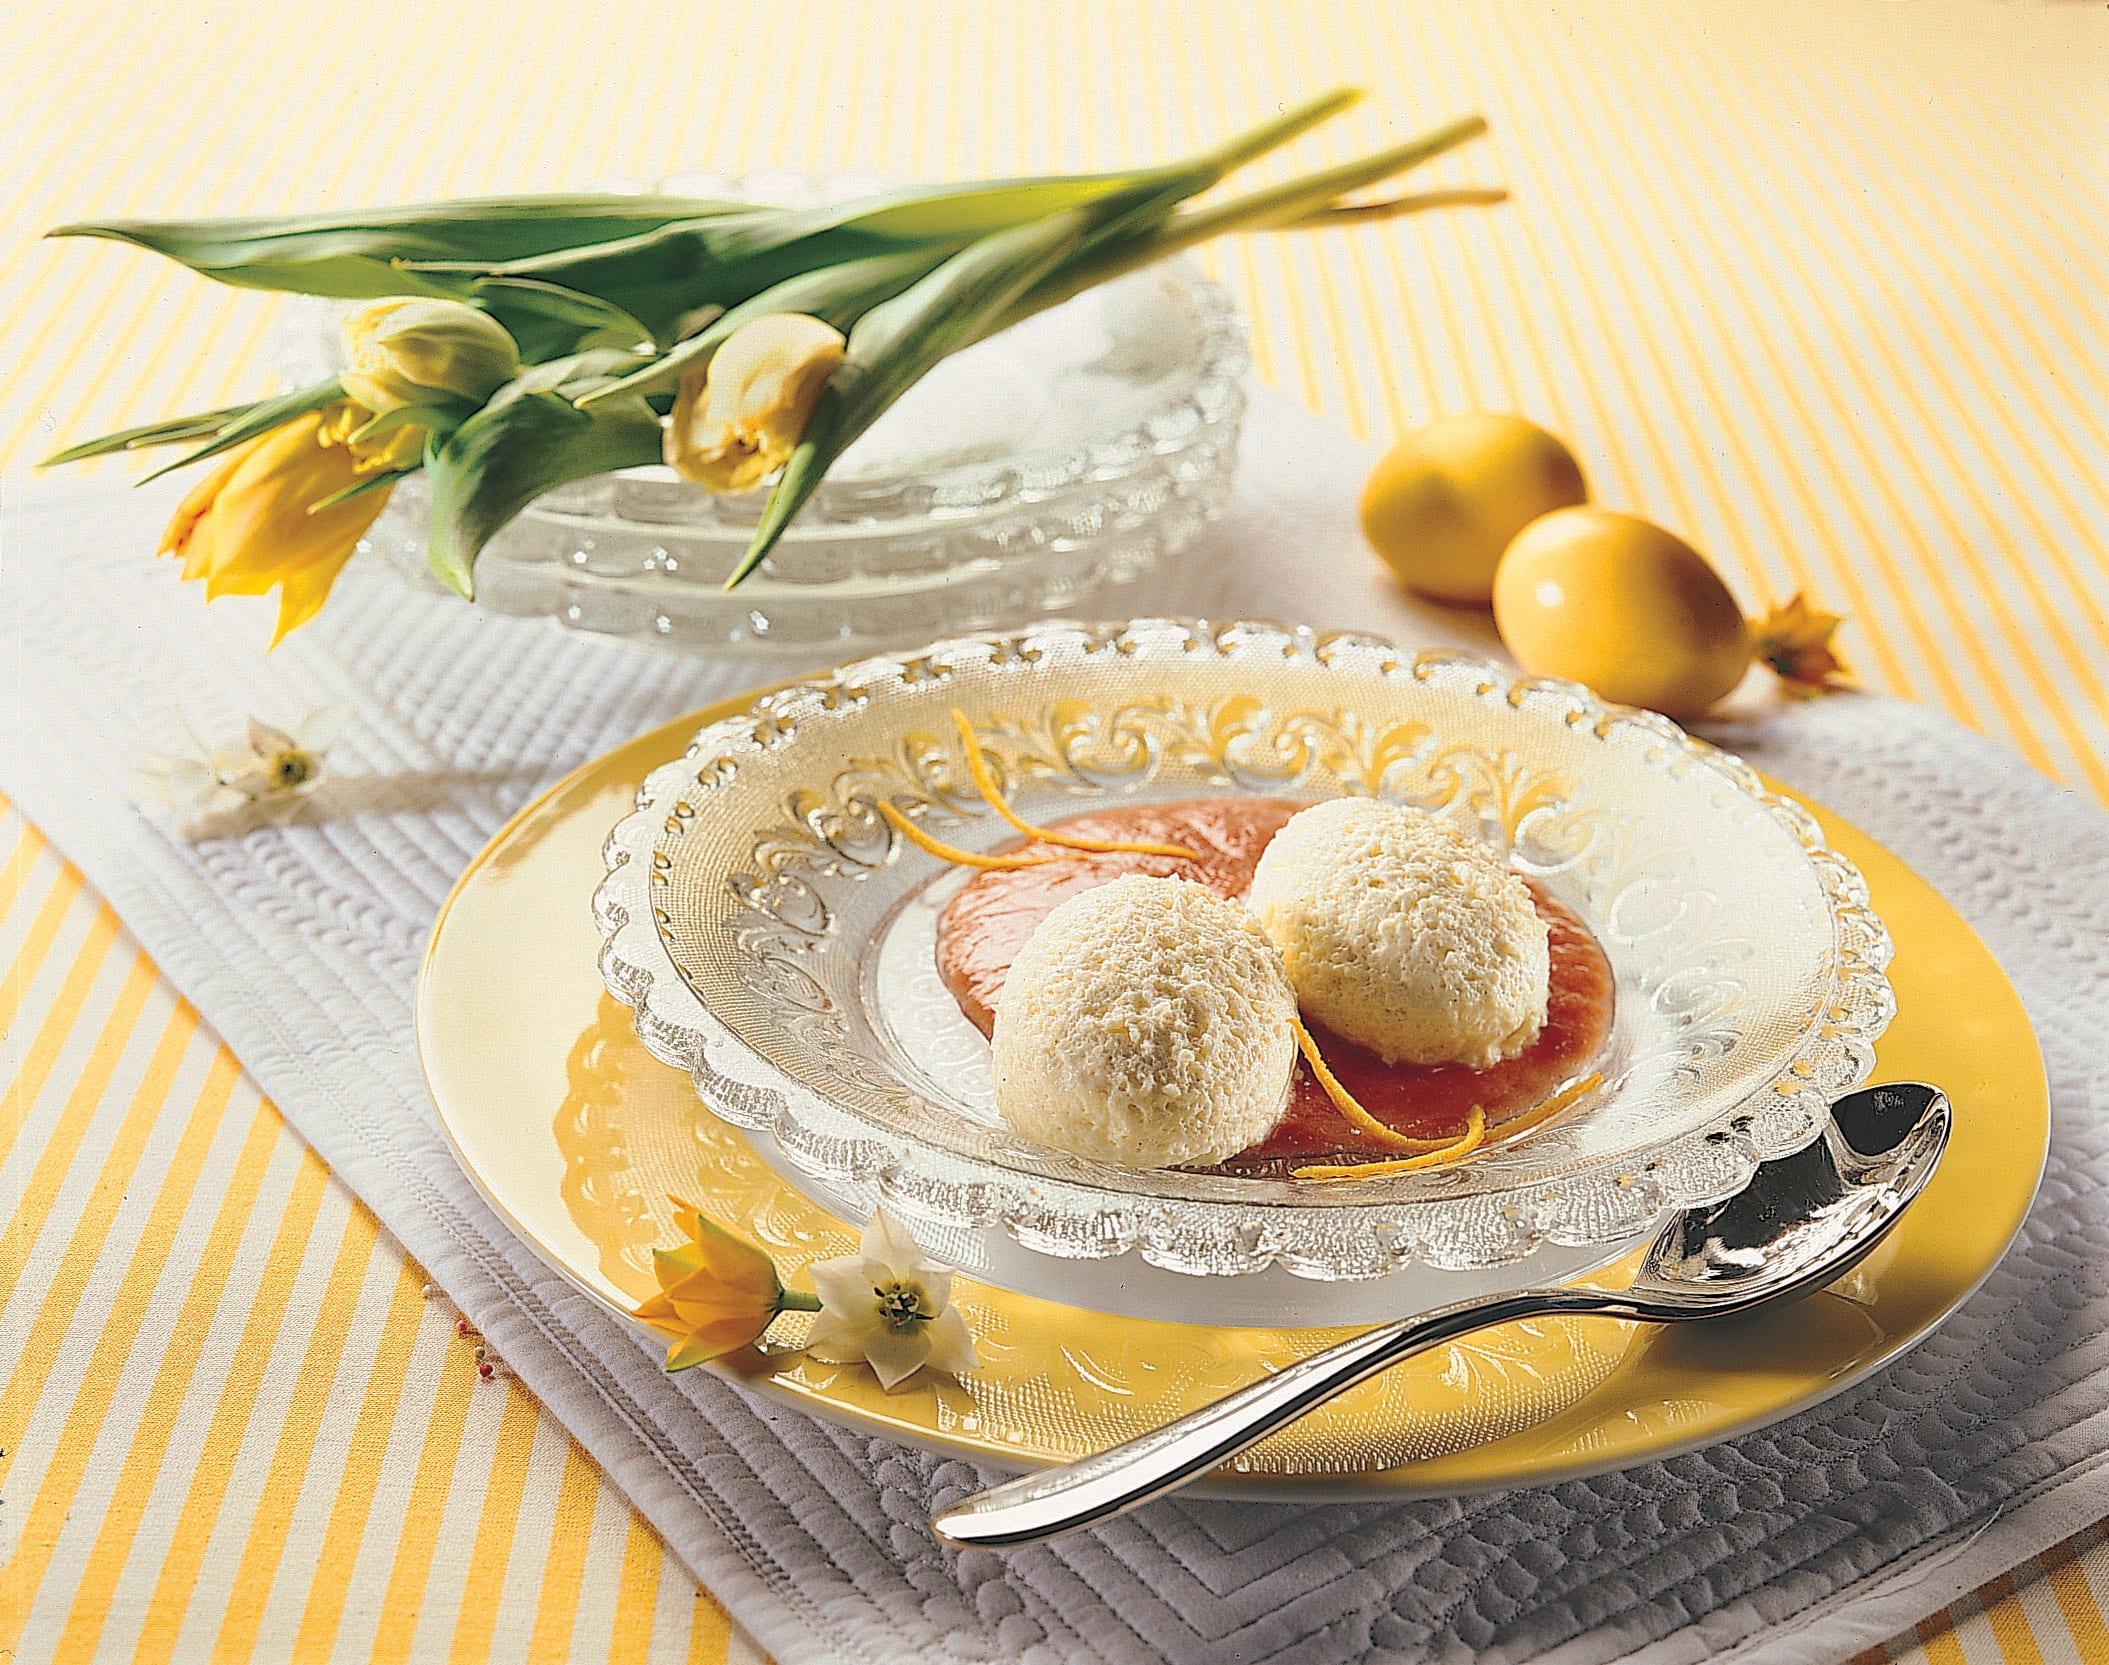 Mousse de semoule, sauce rhubarbe